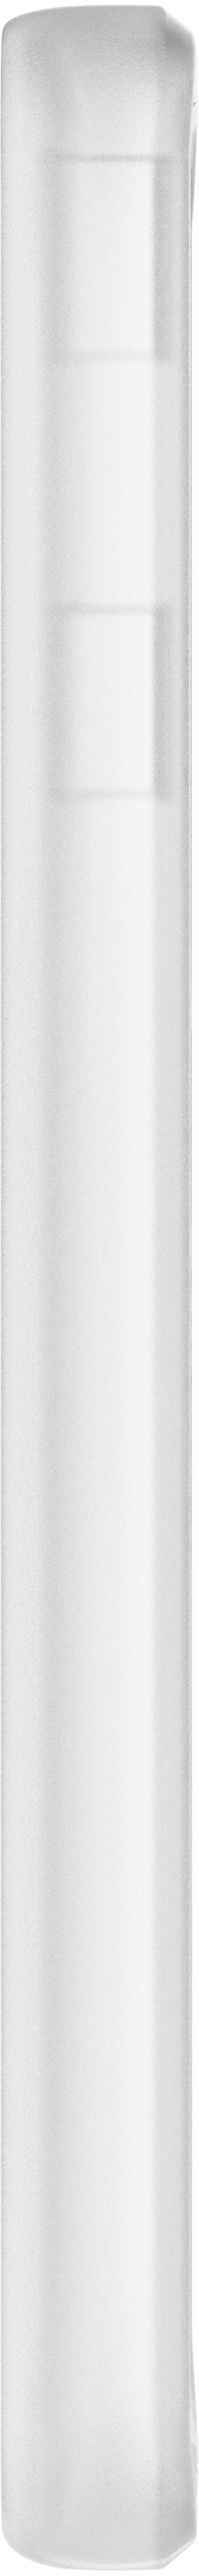 Otterbox React Series Samsung Galaxy S21 Ultra Klar